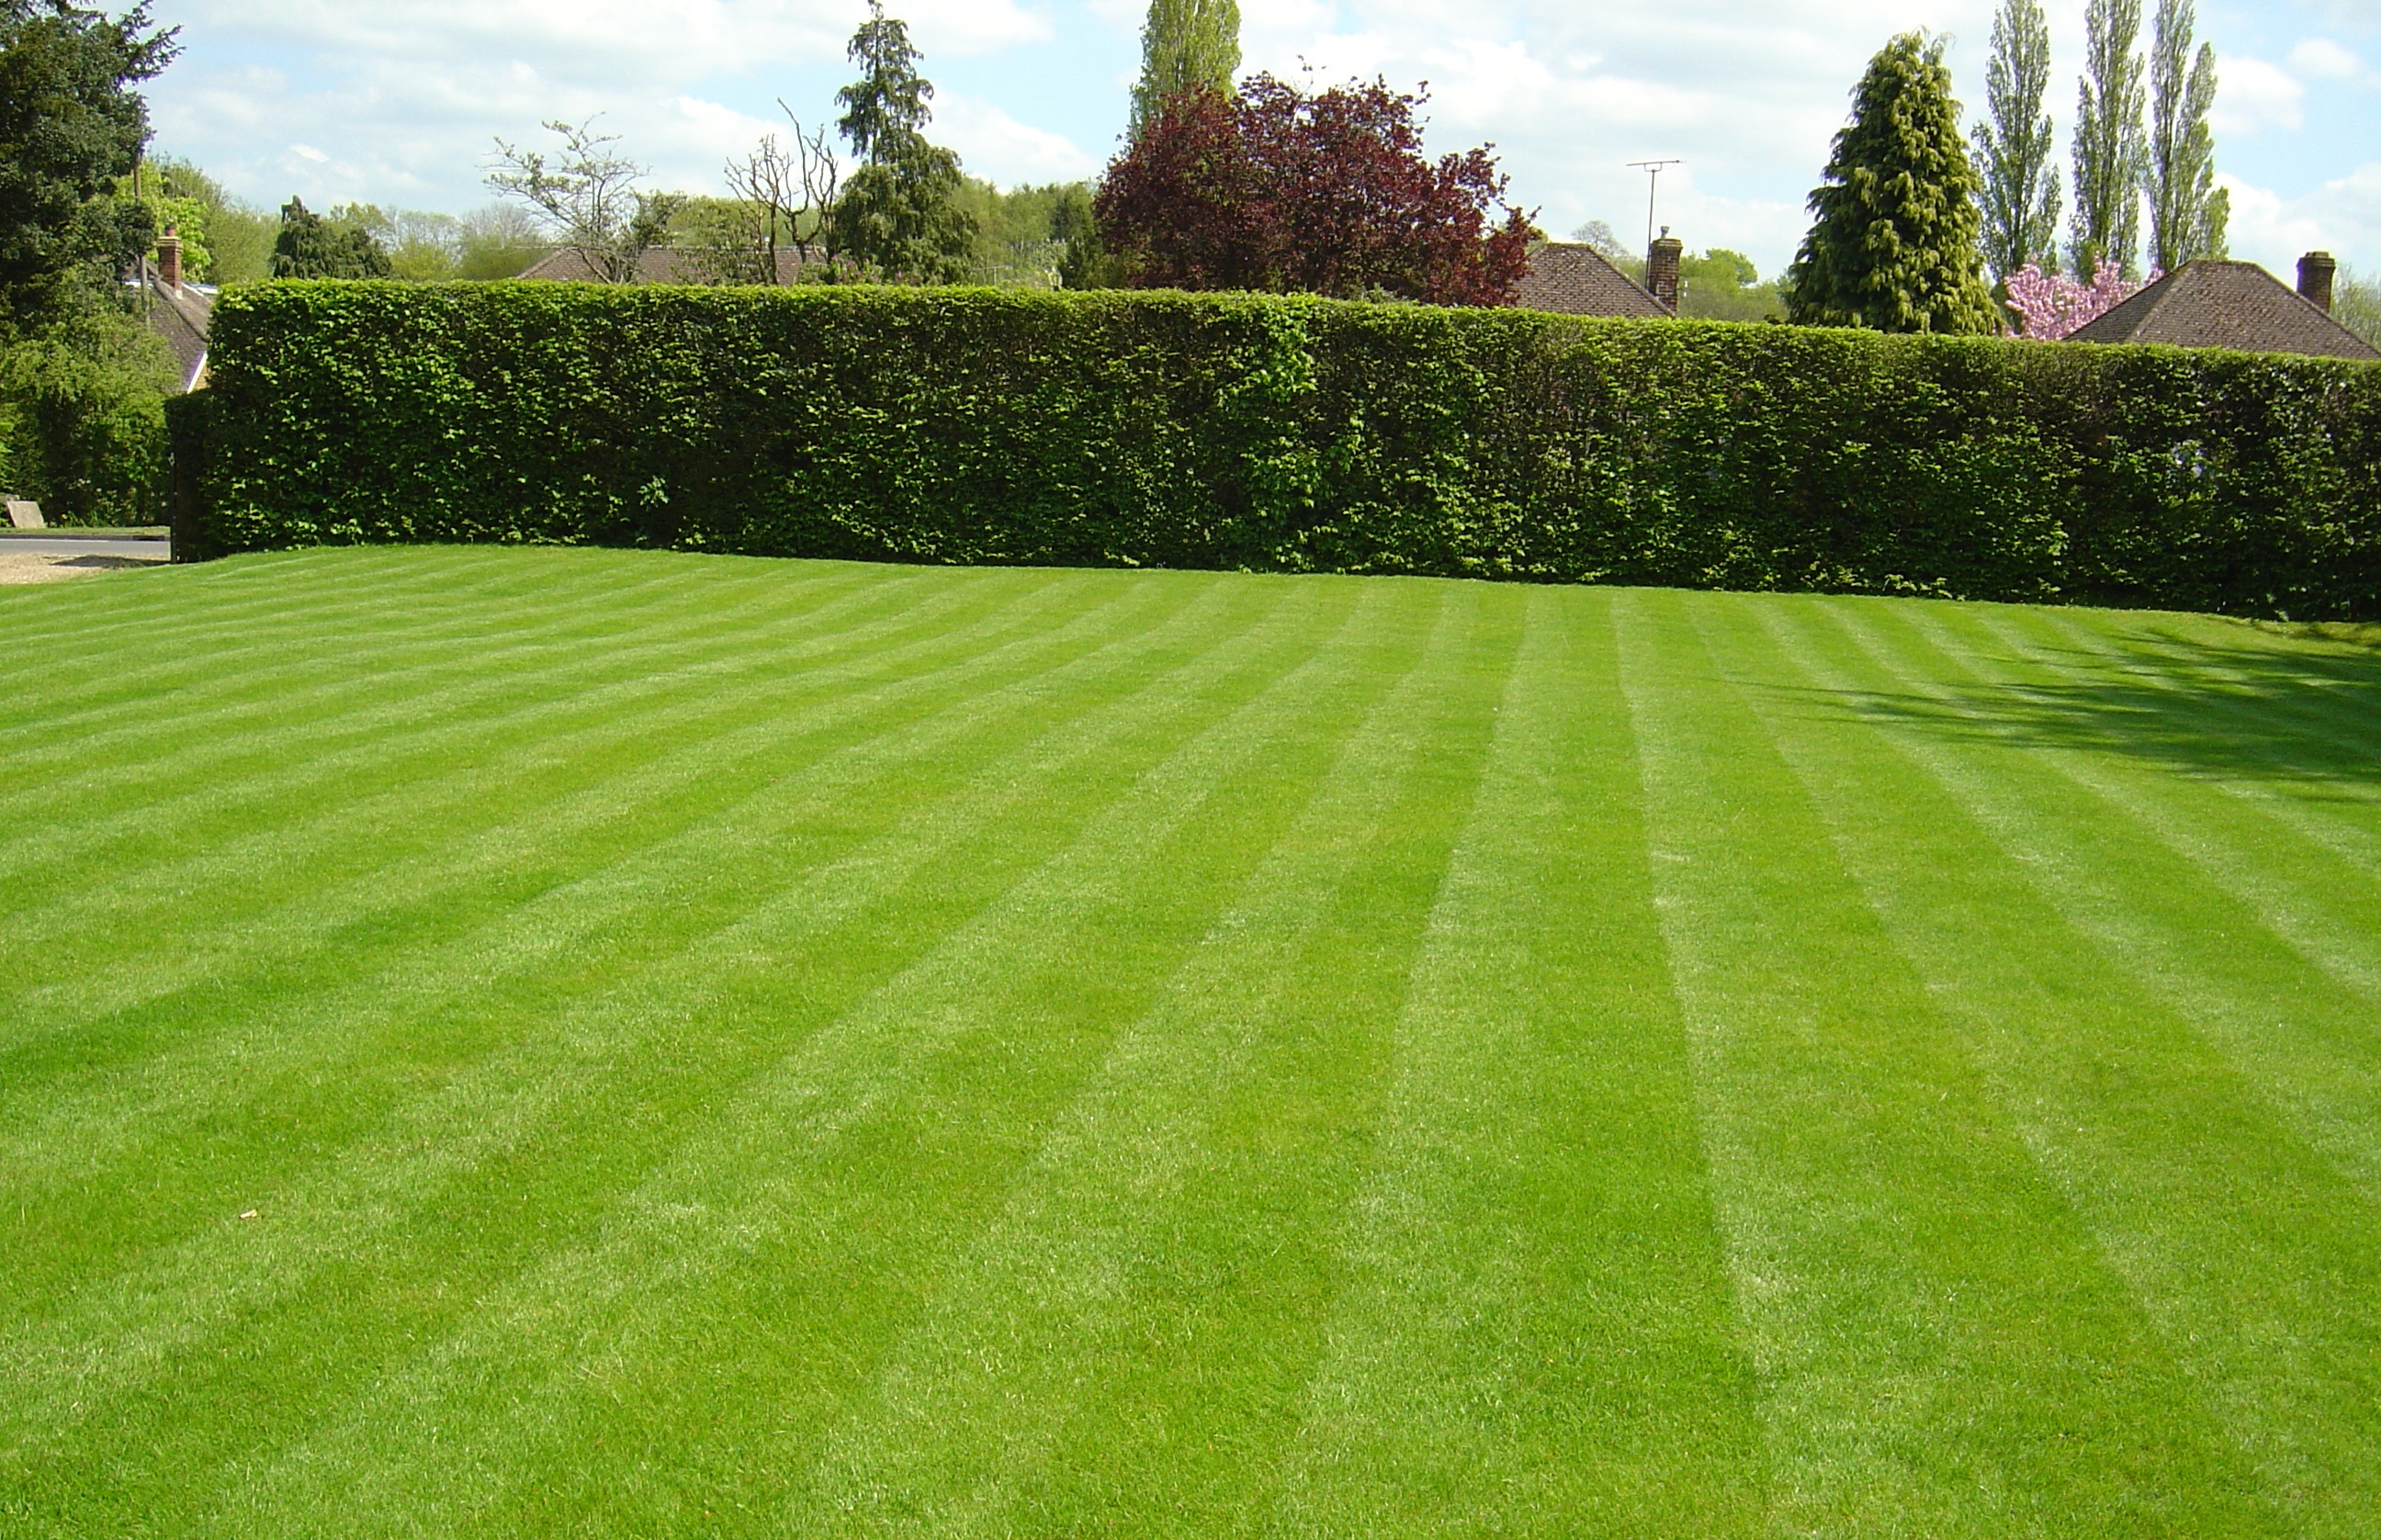 Warrington lawn care